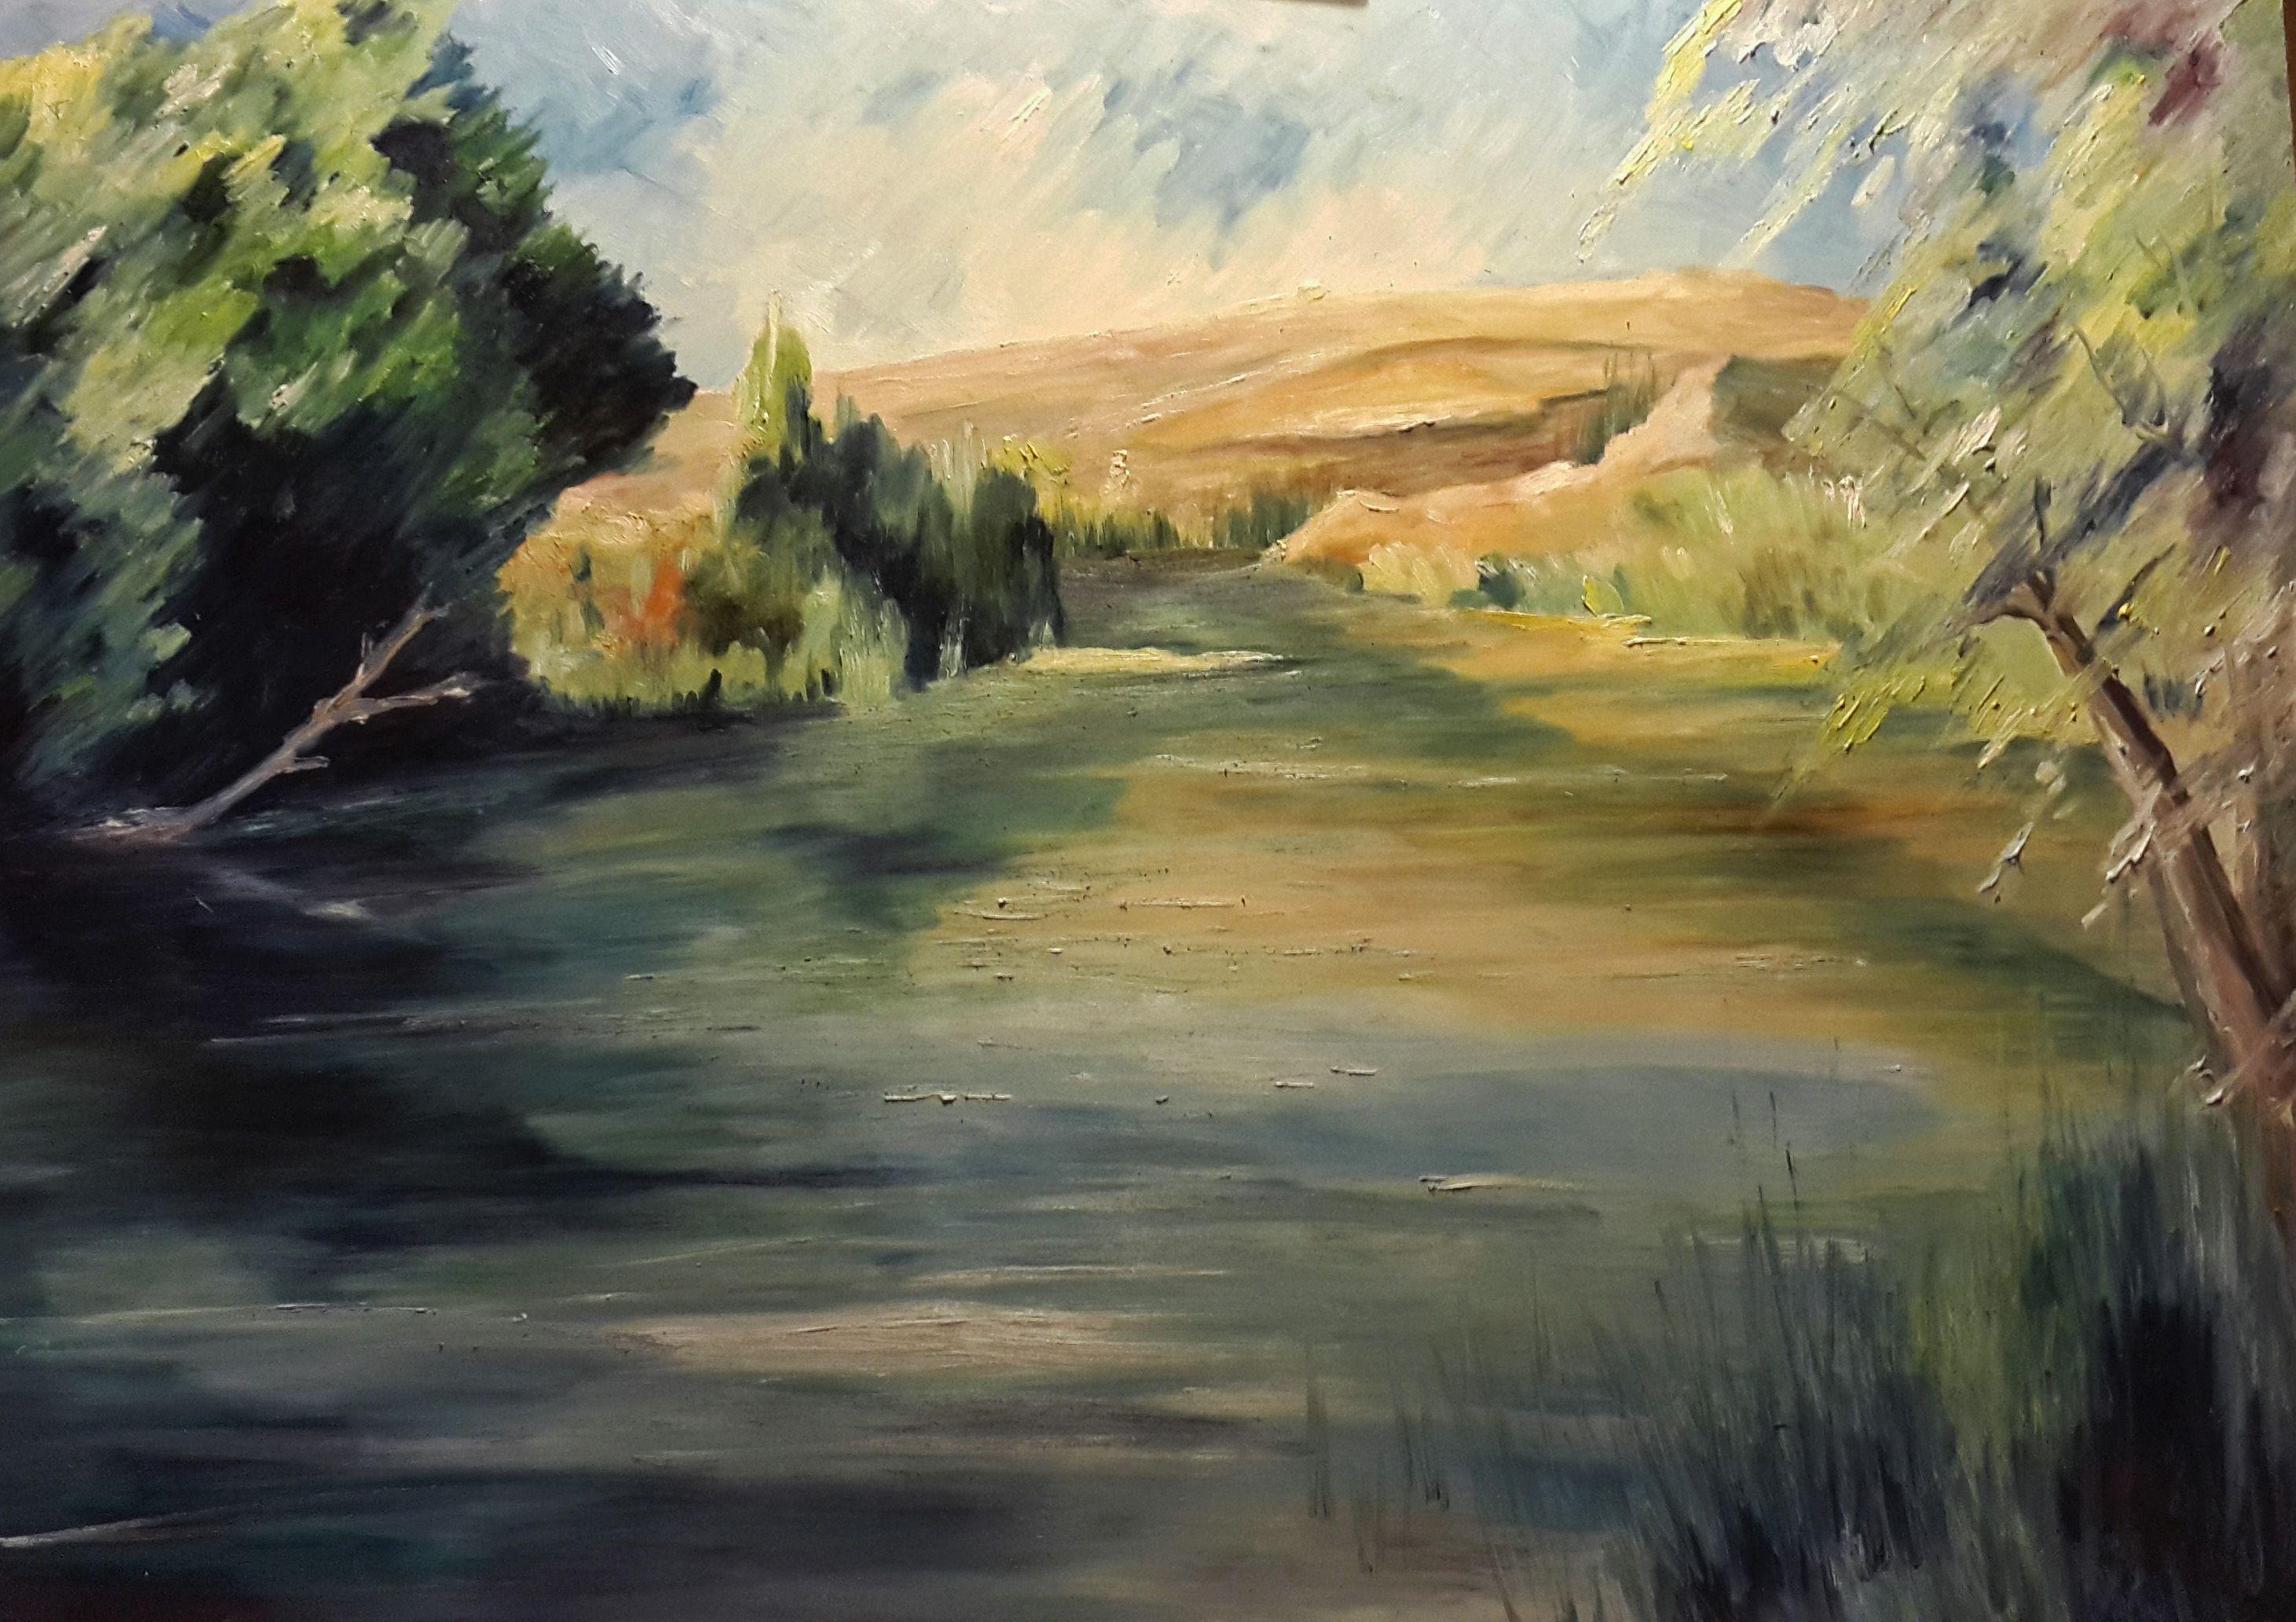 Título: Paisaje del Lago - Óleo (90 X 60cm) - San Luis Argentina - Autora: Alejandra Etcheverry